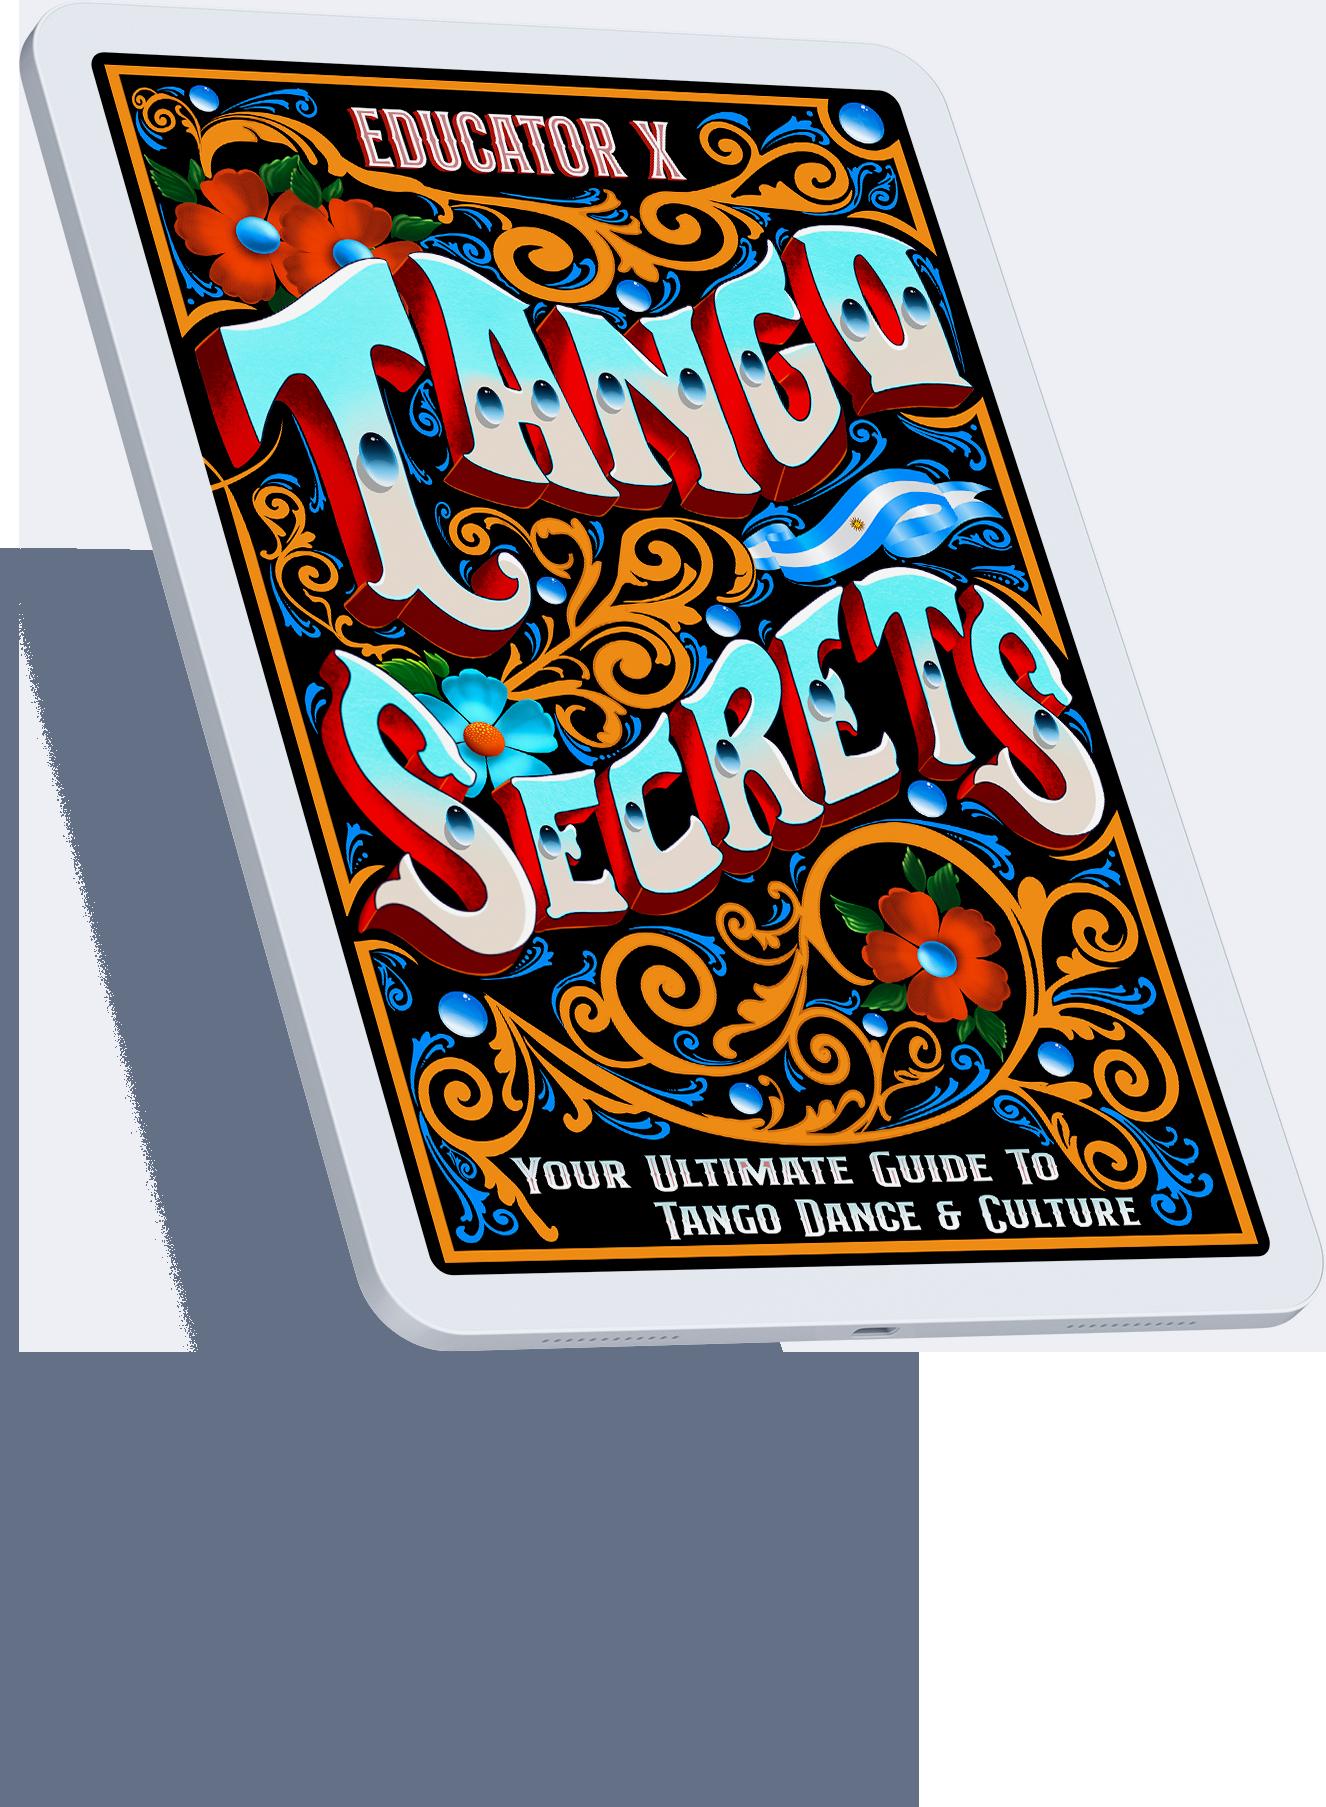 Tango Secrets Book Cover on iPad Air